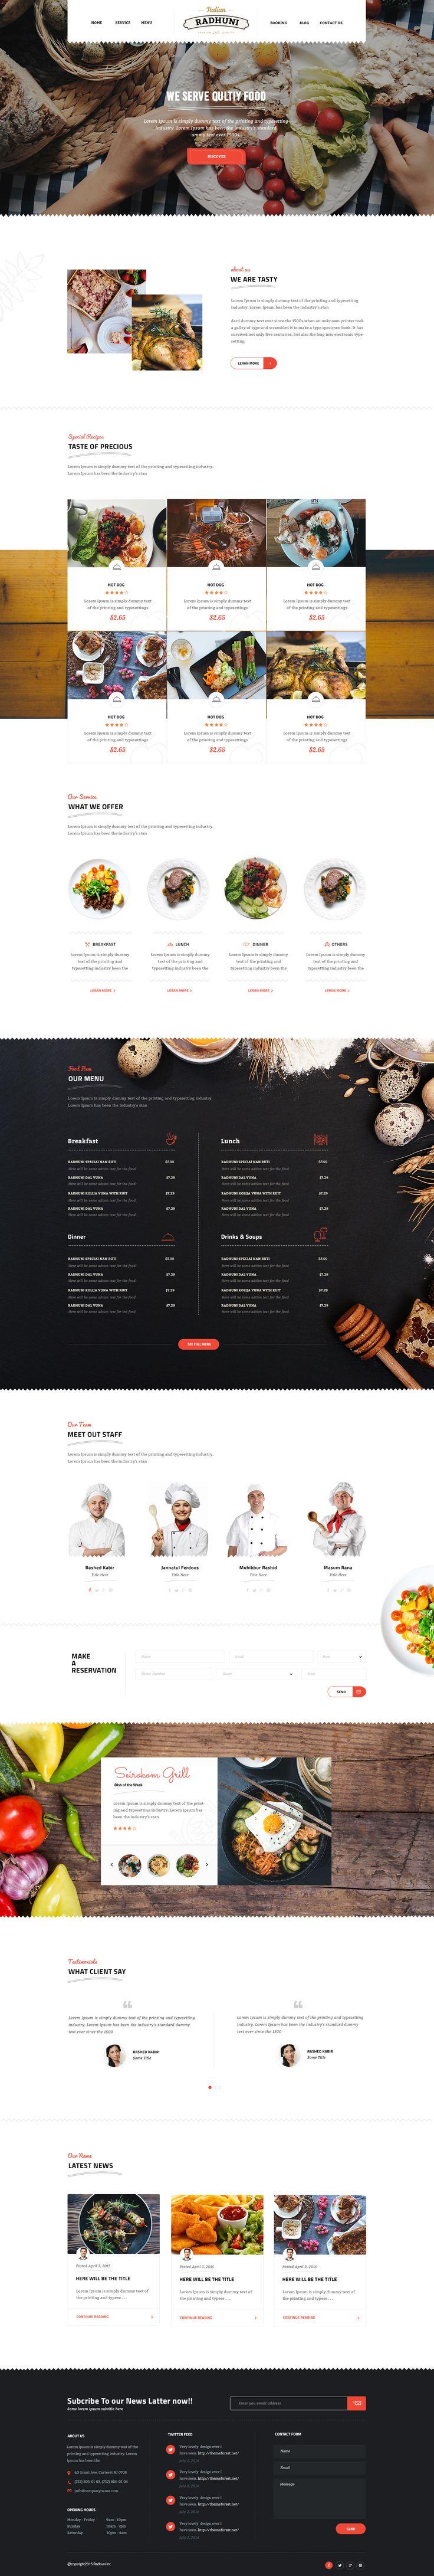 Italian Radhuni is modern and creative responsive WordPress Restaurant Theme.